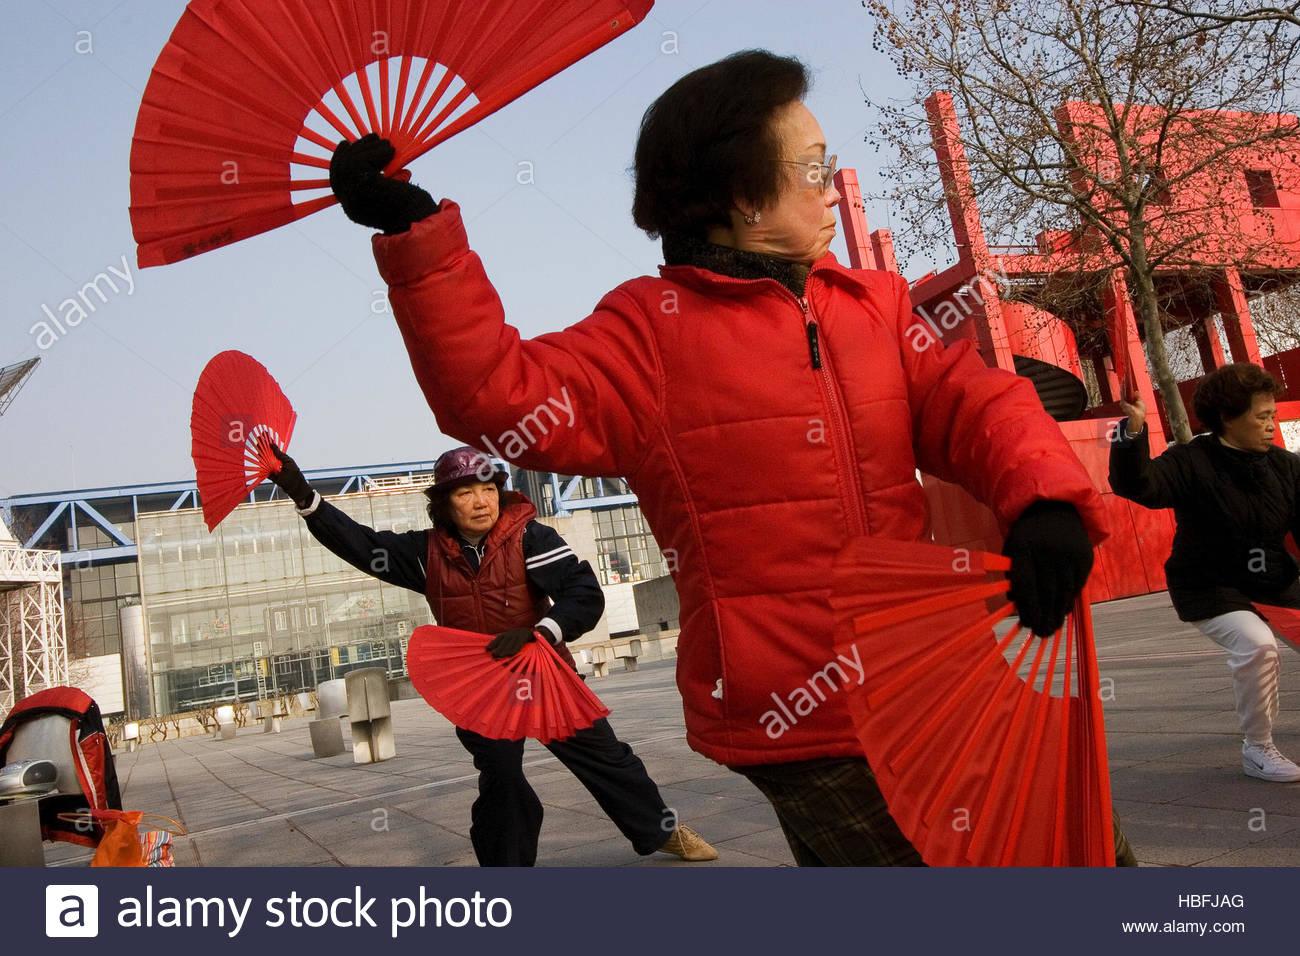 Members of the Asian community meet in Parc de la Villette to practice Tai Chi. - Stock Image